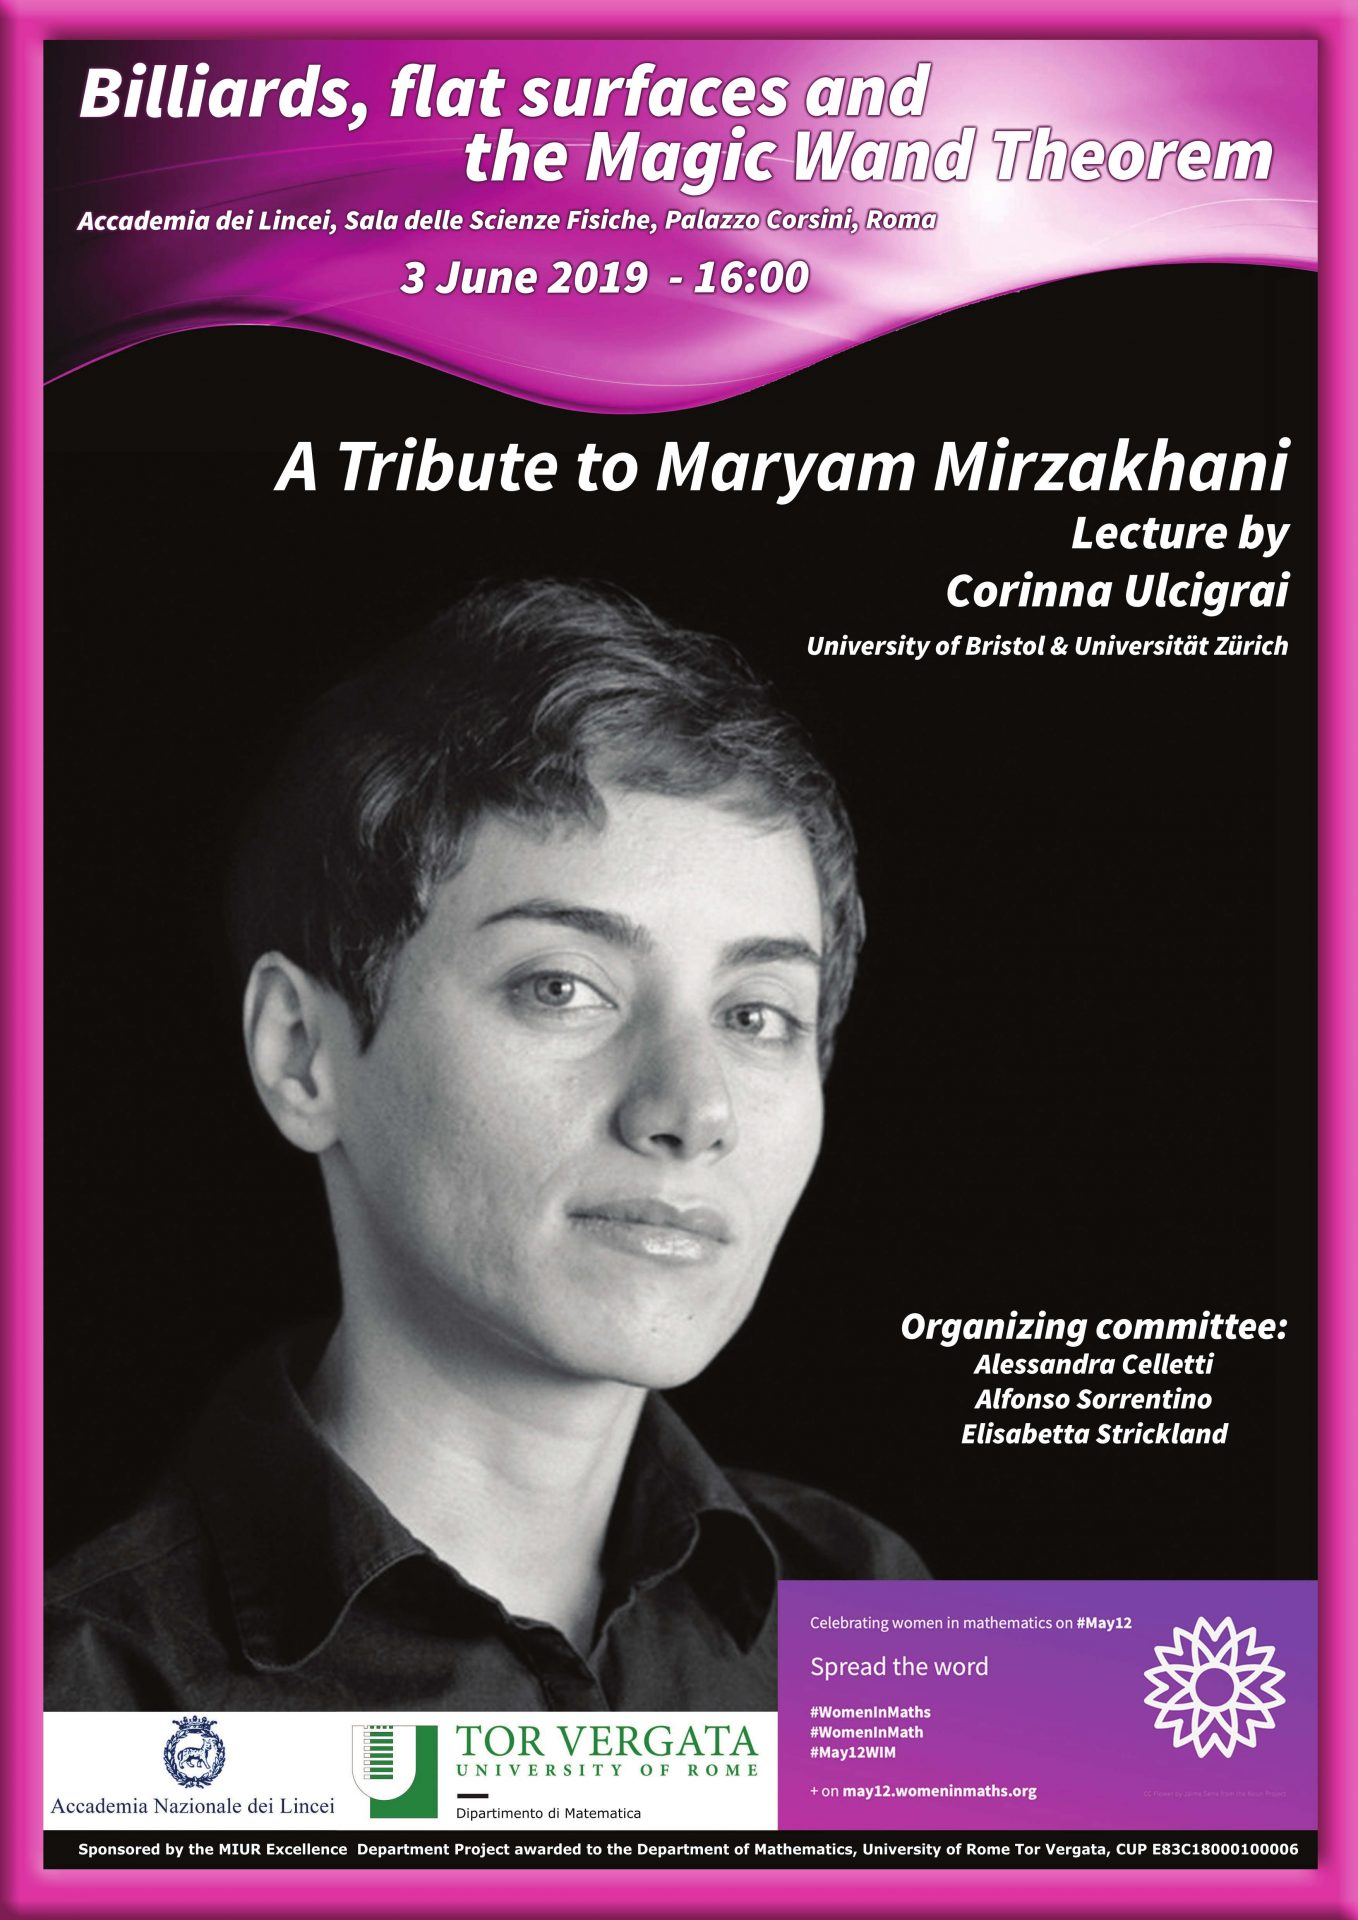 A tribute to Maryam Mirzakhani, 3 giugno 2019 ore 16:00 (Accademia dei Lincei)